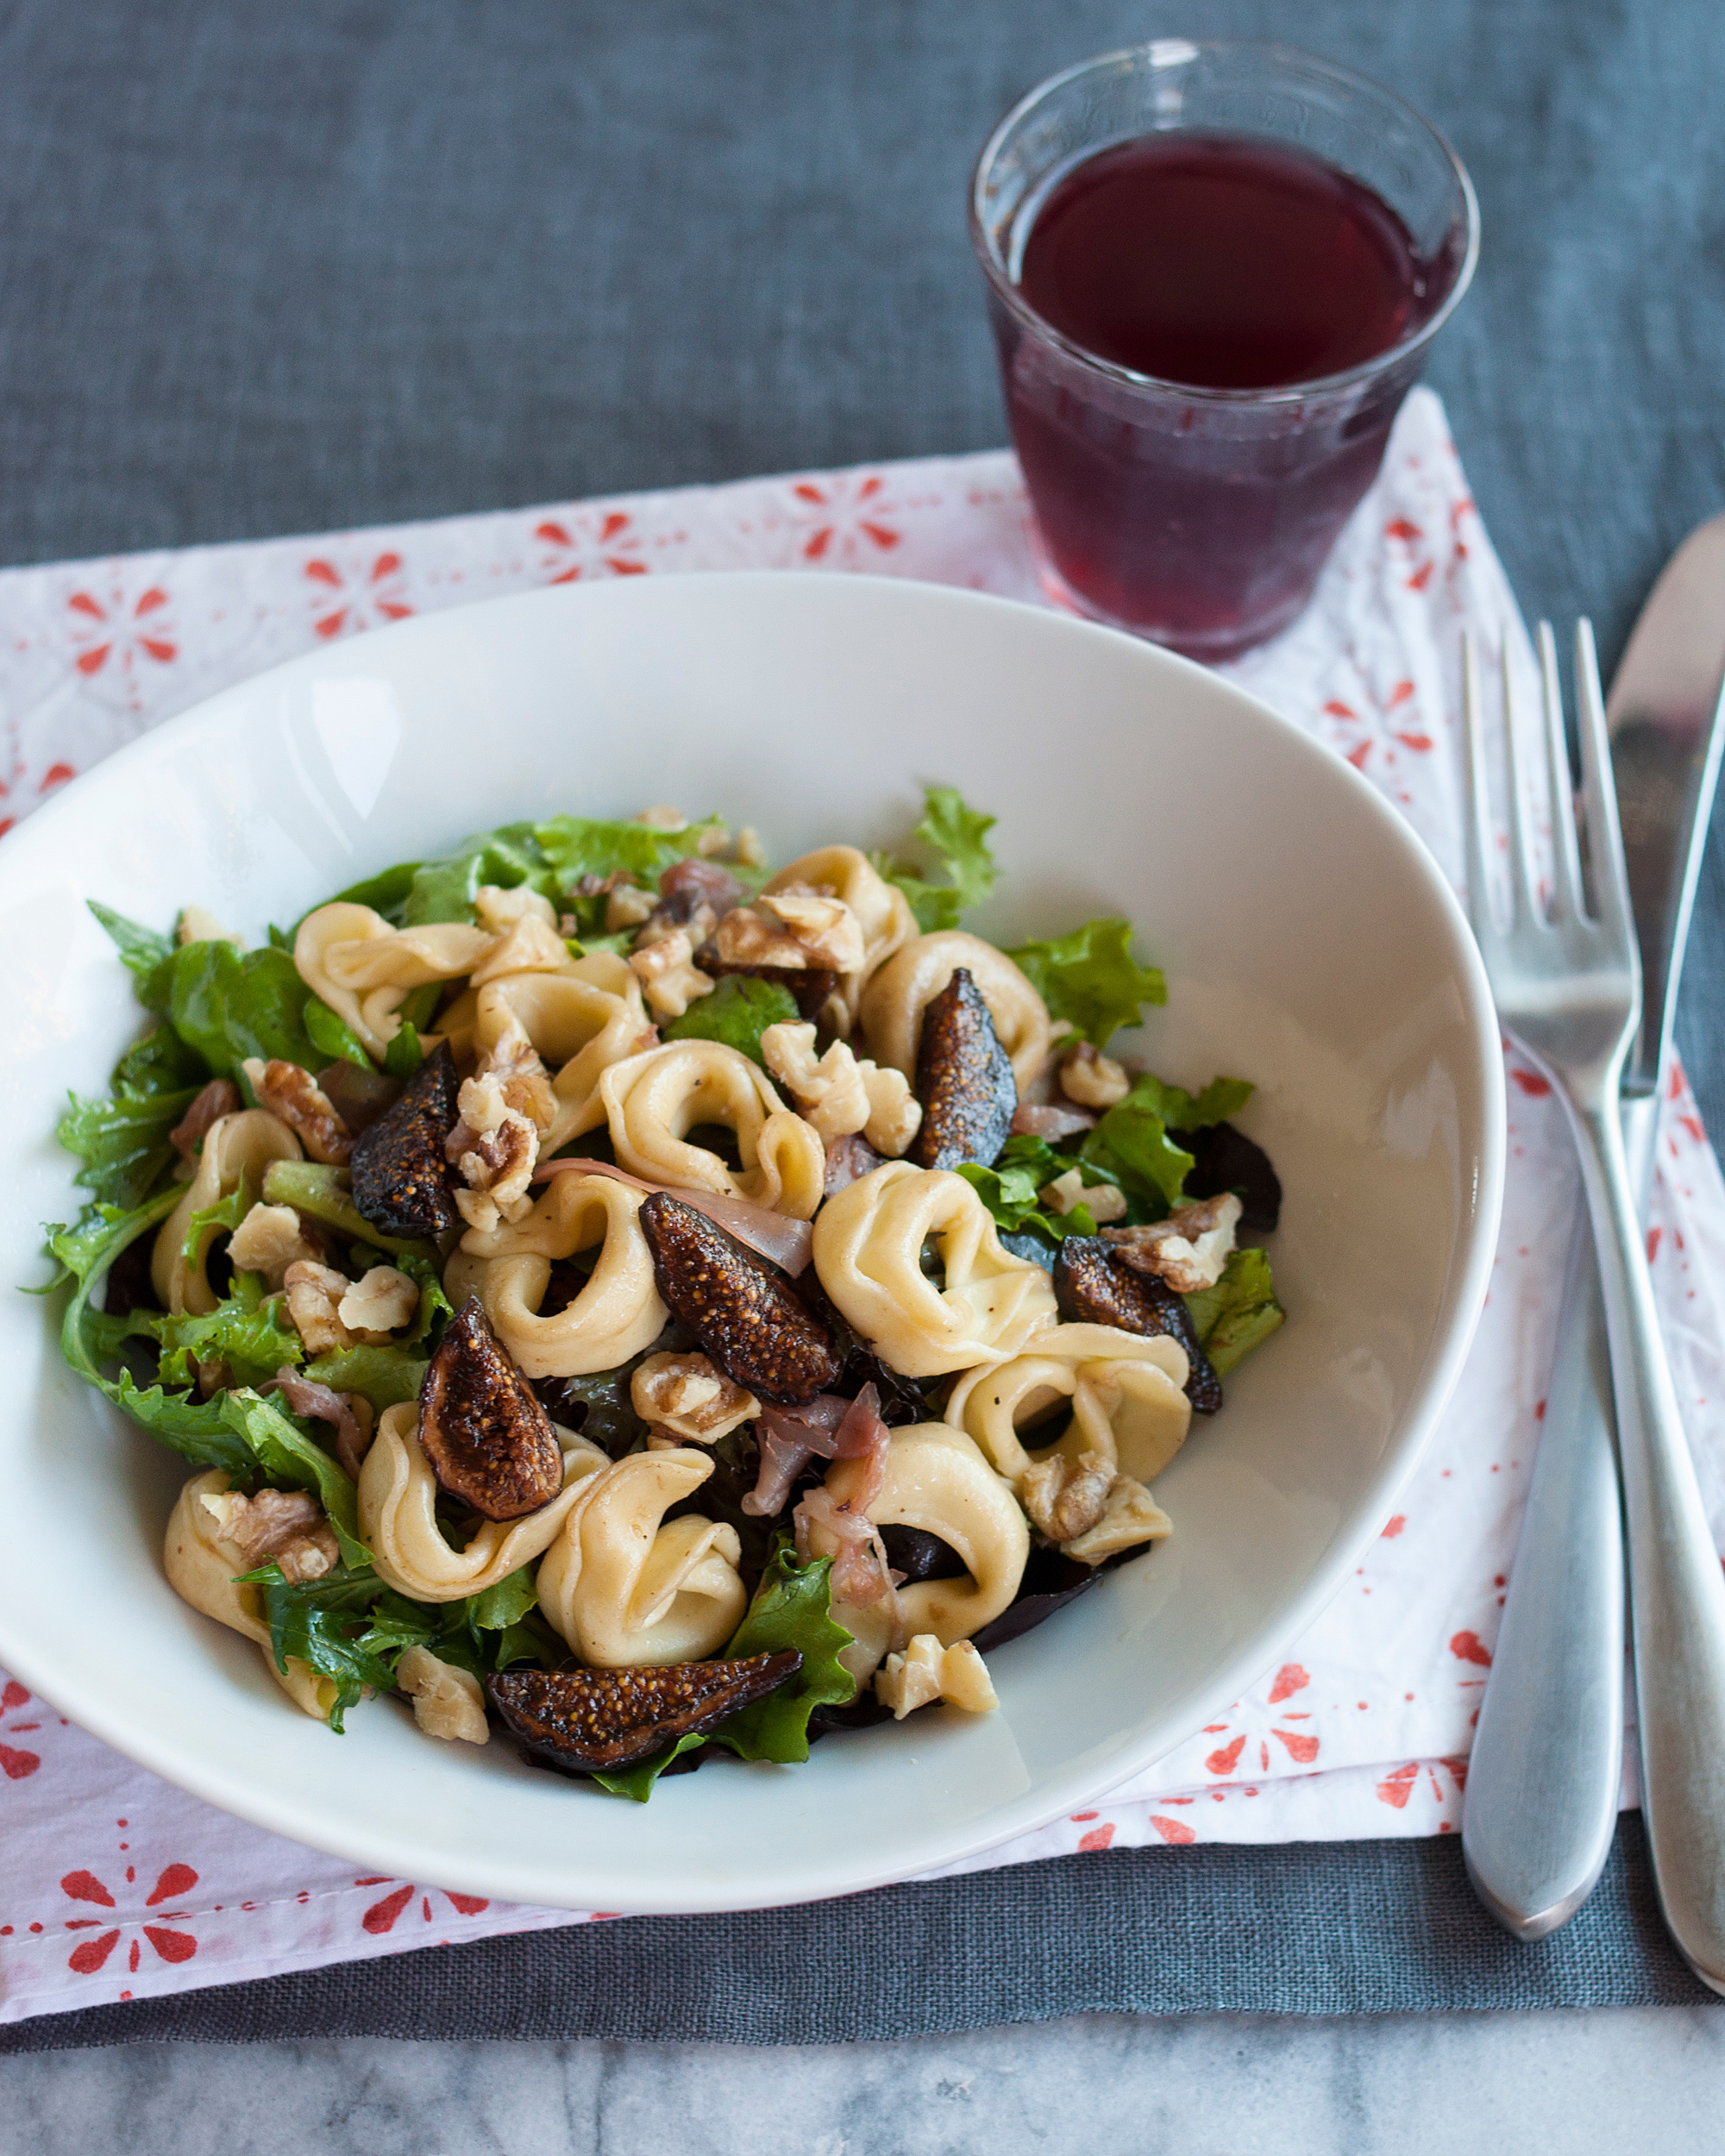 Quick Lunch Recipe: Tortellini Salad with Figs, Walnuts, Prosciutto & Greens | Kitchn